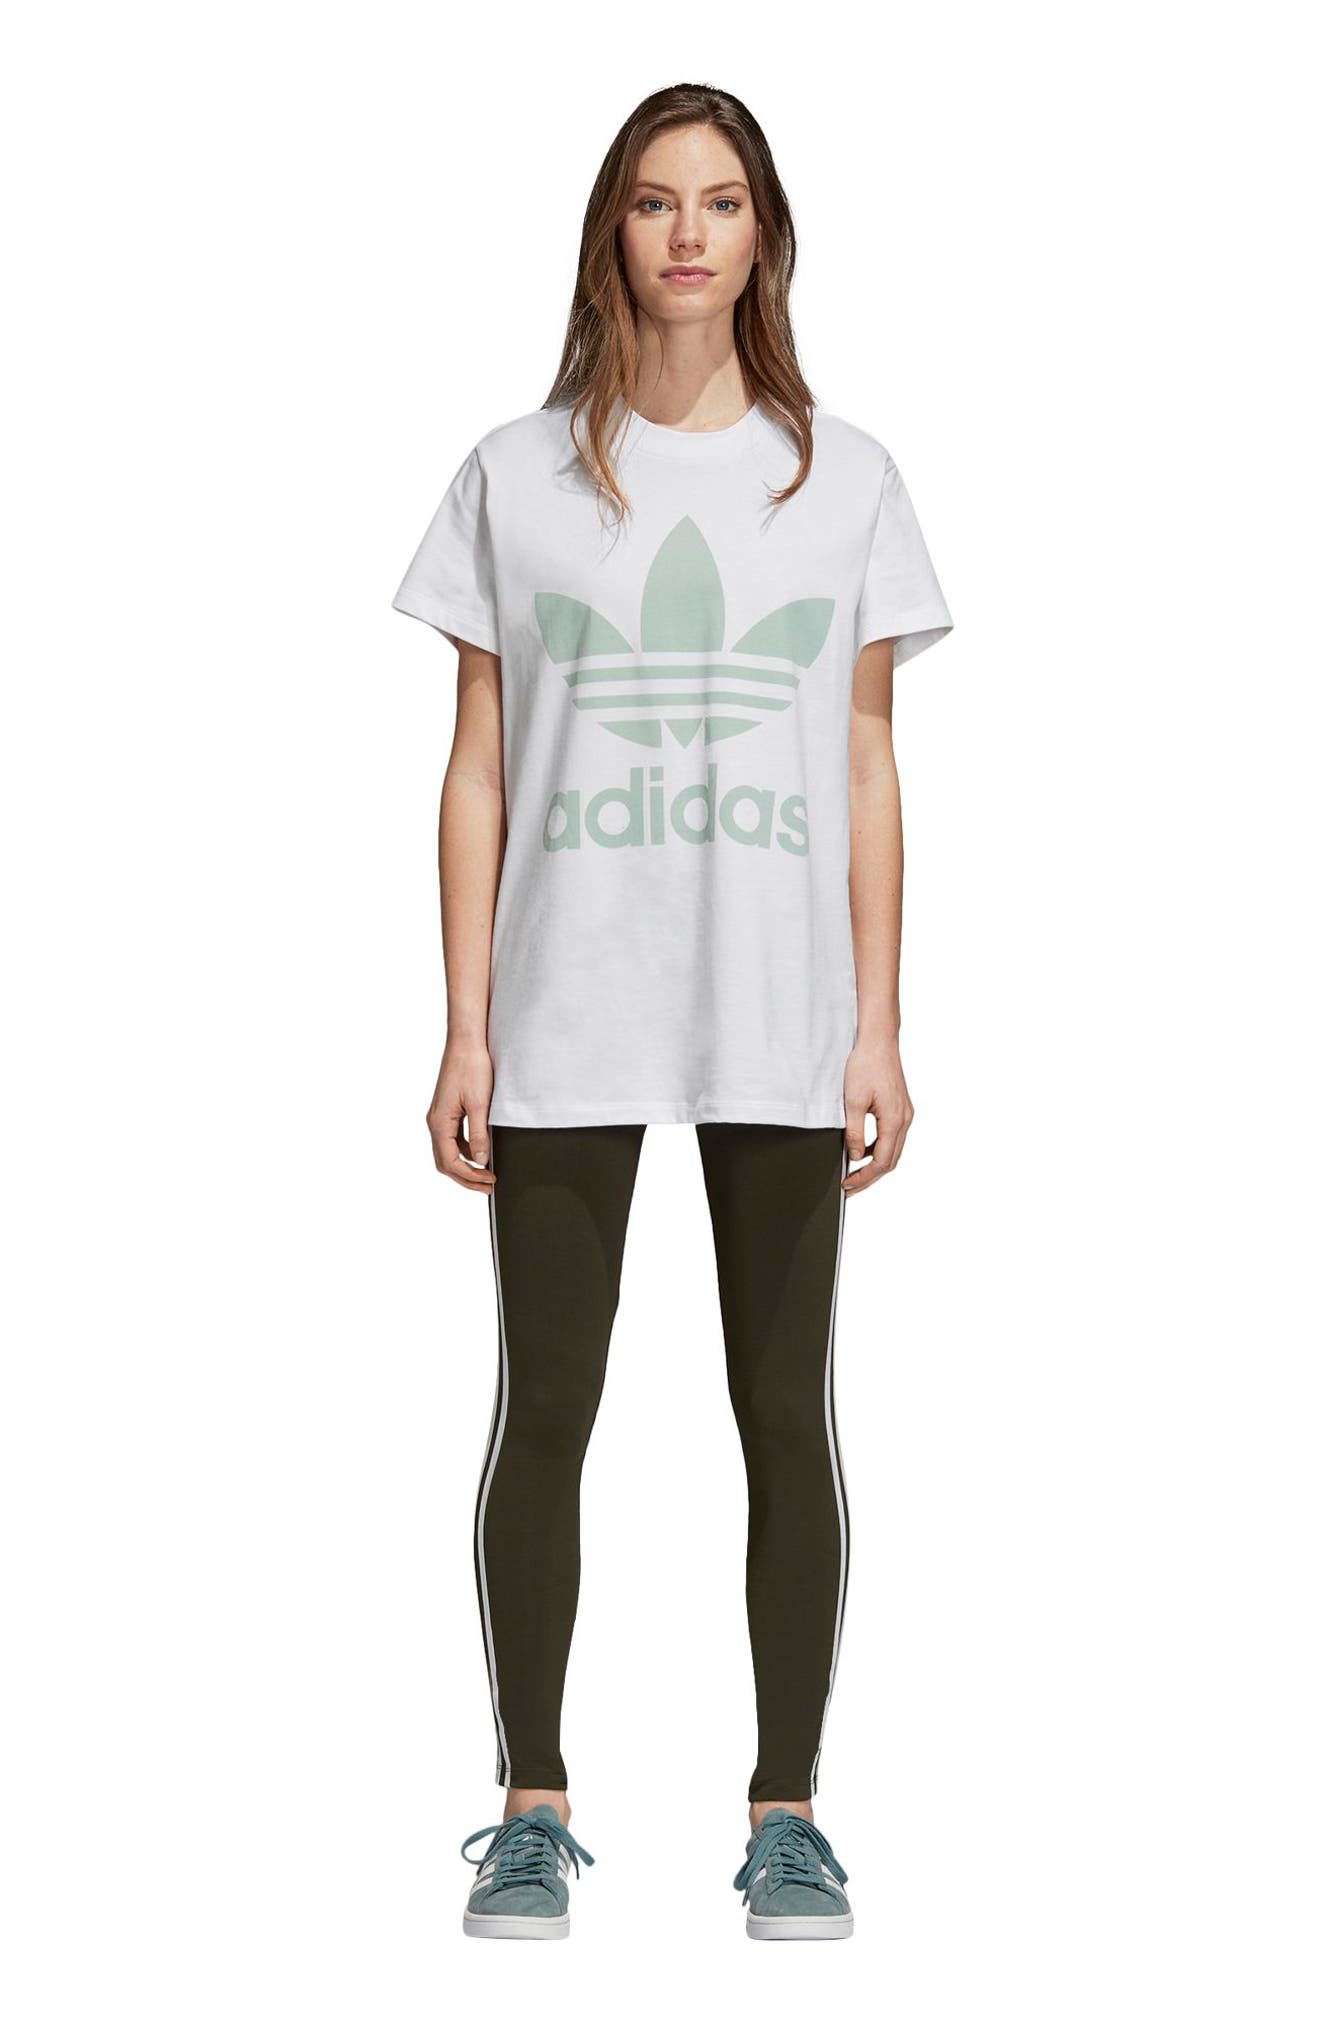 ,                             adidas 3-Stripes Tights,                             Alternate thumbnail 29, color,                             300